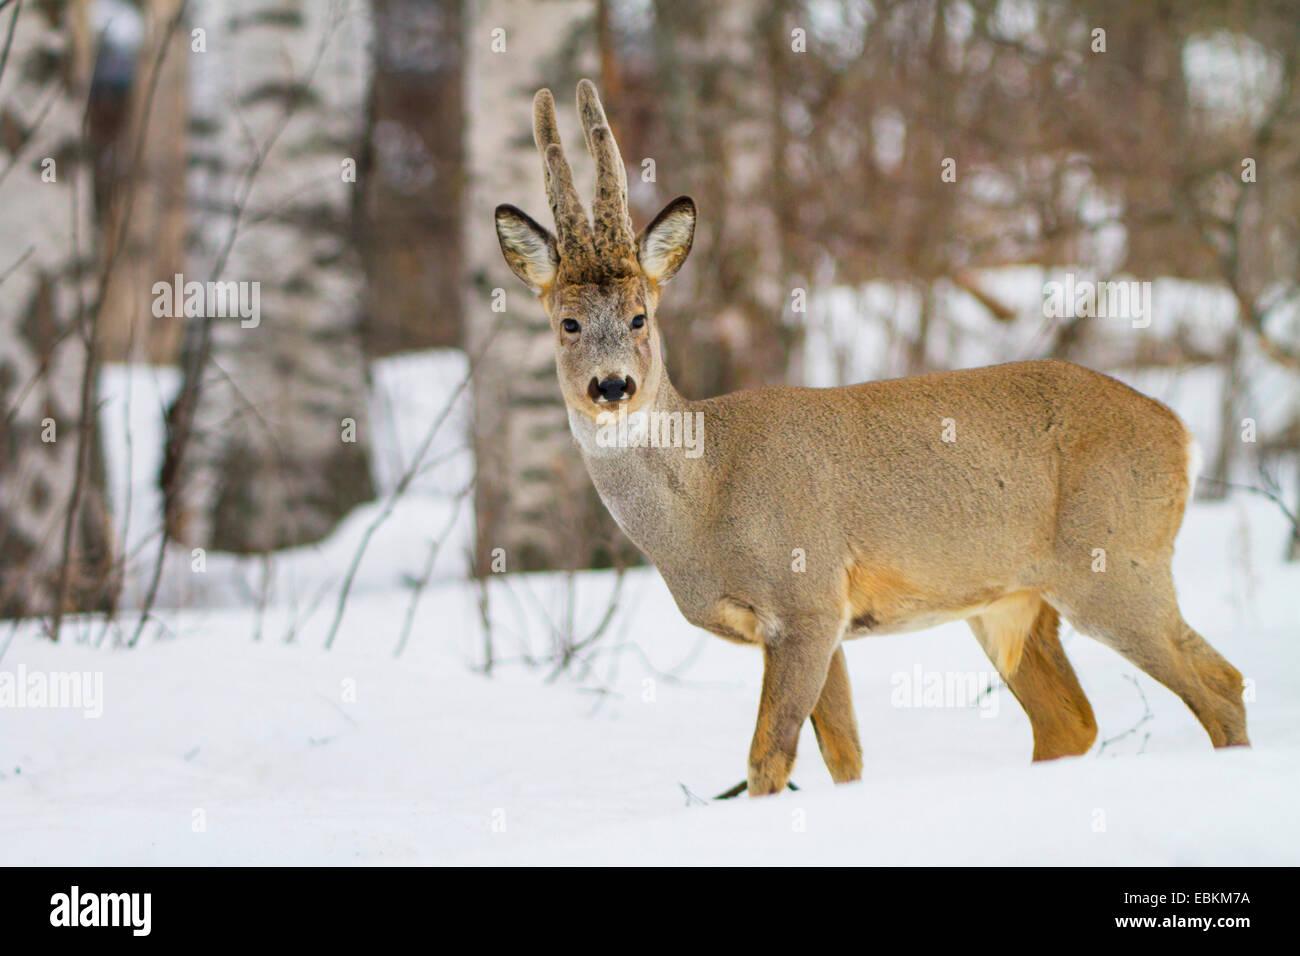 roe deer (Capreolus capreolus), in snow in winter forest, Sweden, Hamra National Park - Stock Image